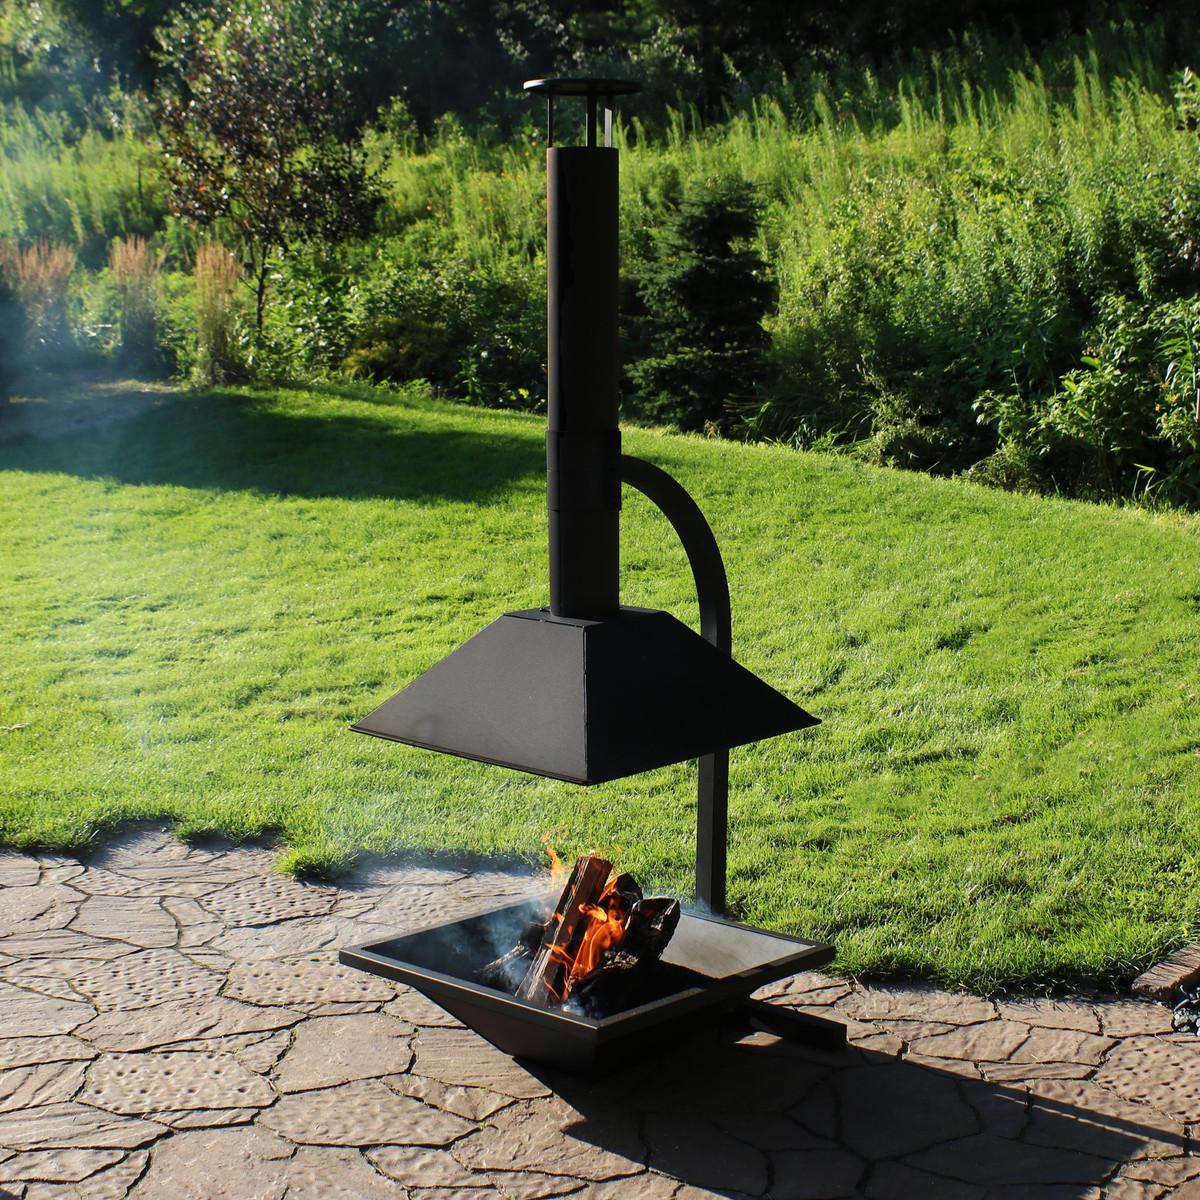 Sunnydaze Black Steel Outdoor Wood Burning Modern Backyard